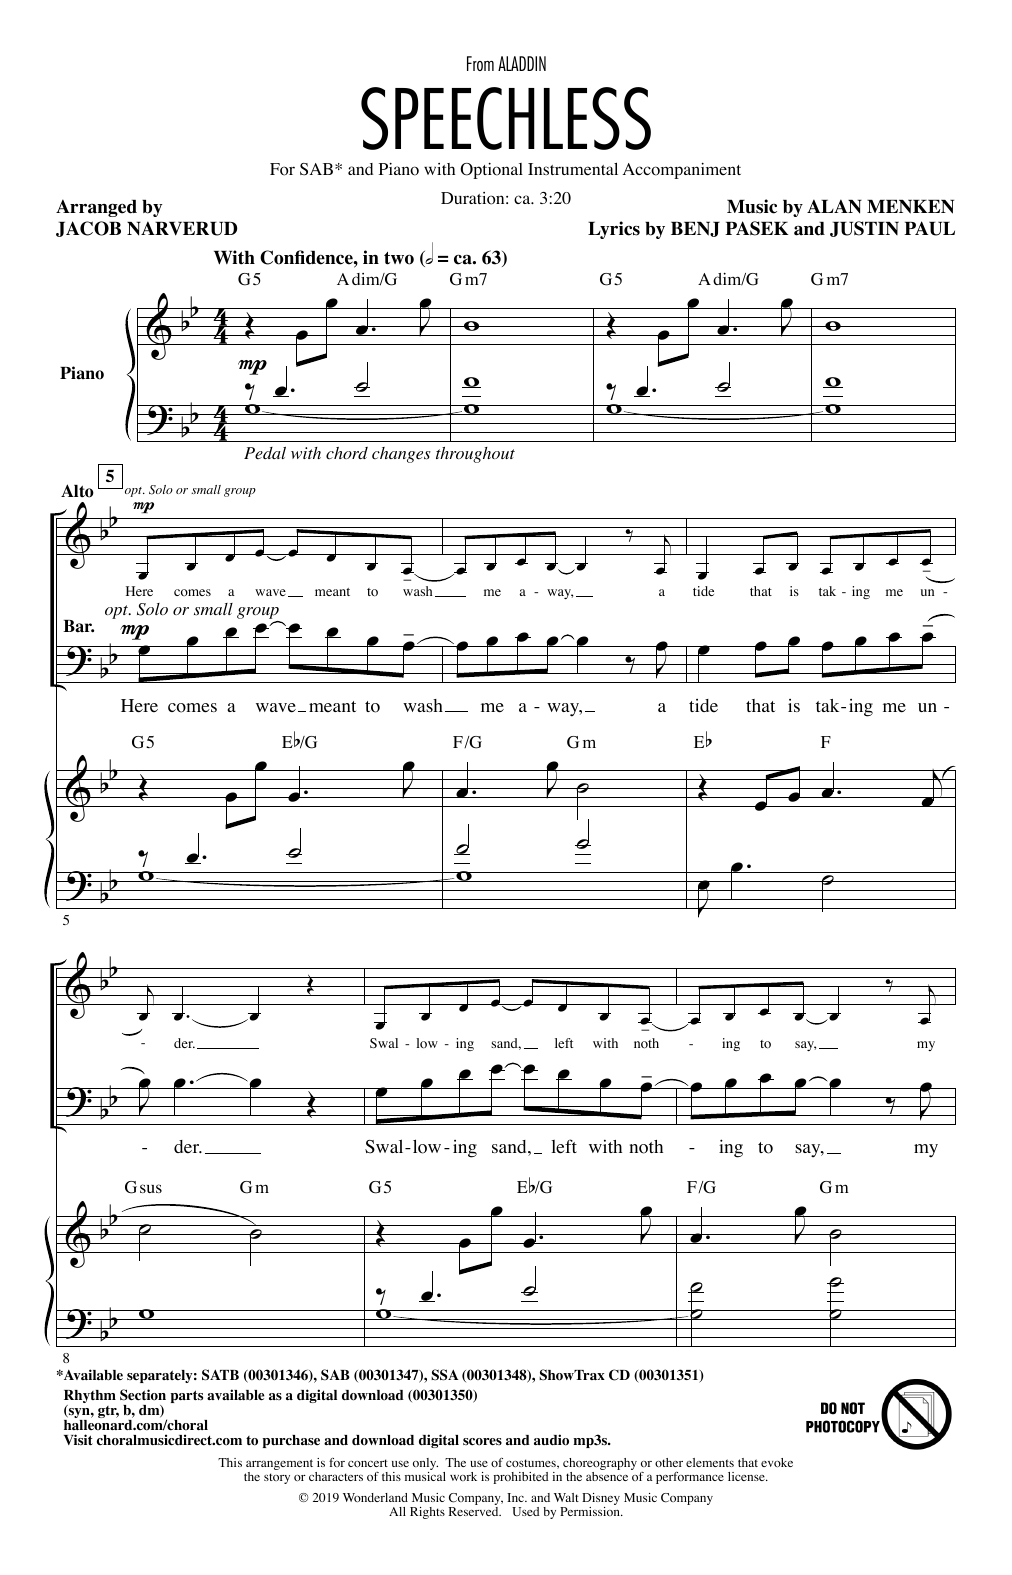 Speechless (from Disney's Aladdin) (arr. Jacob Narverud) (SAB Choir)